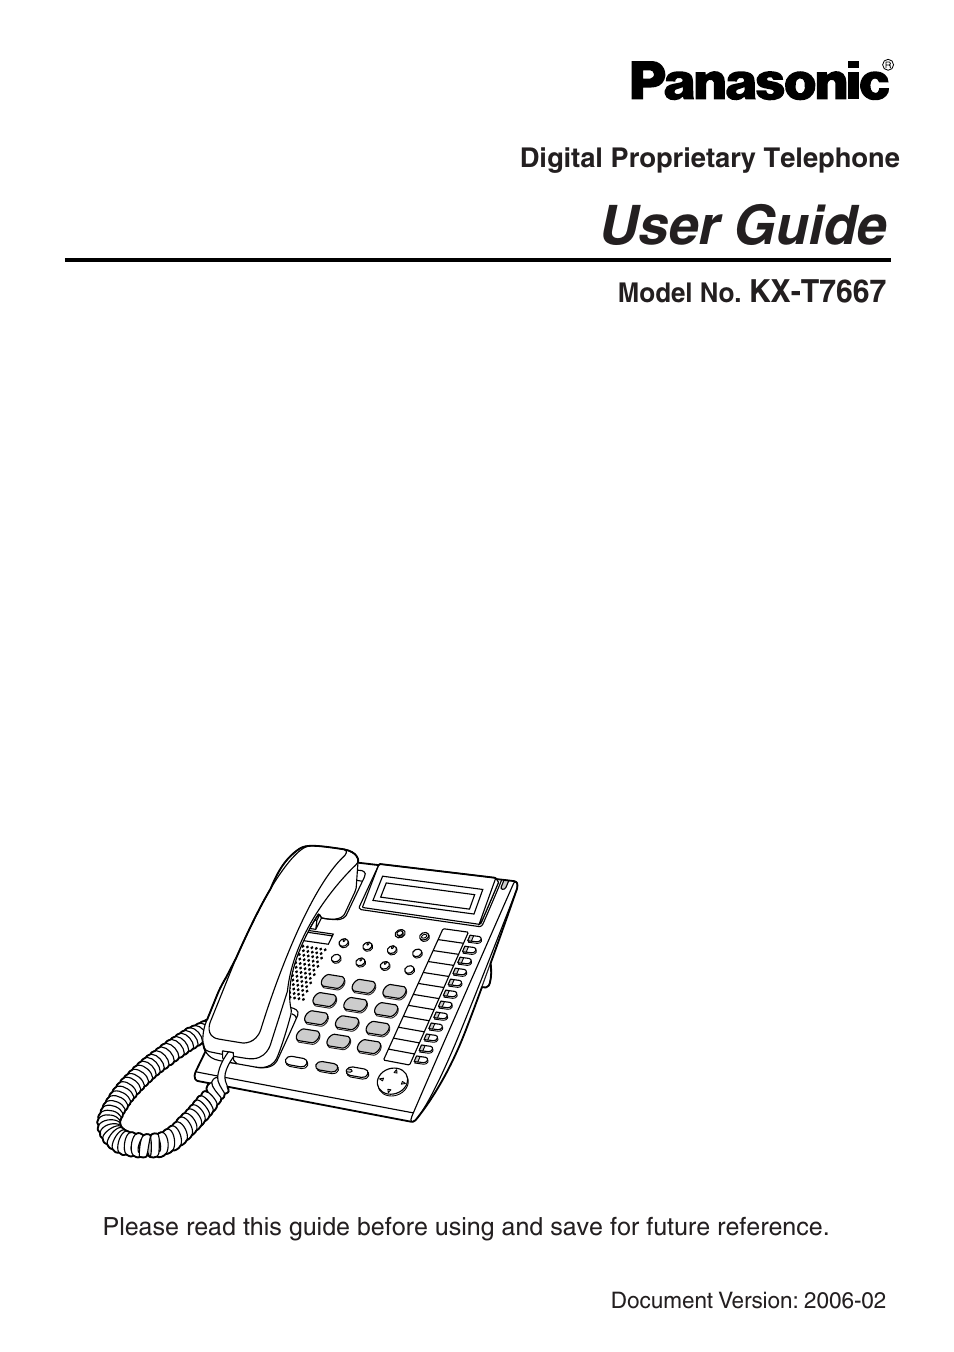 panasonic kx t7667 user manual 10 pages rh manualsdir com Panasonic Kx Phone Manual Tgf350 Panasonic Kx TG4021 Manual